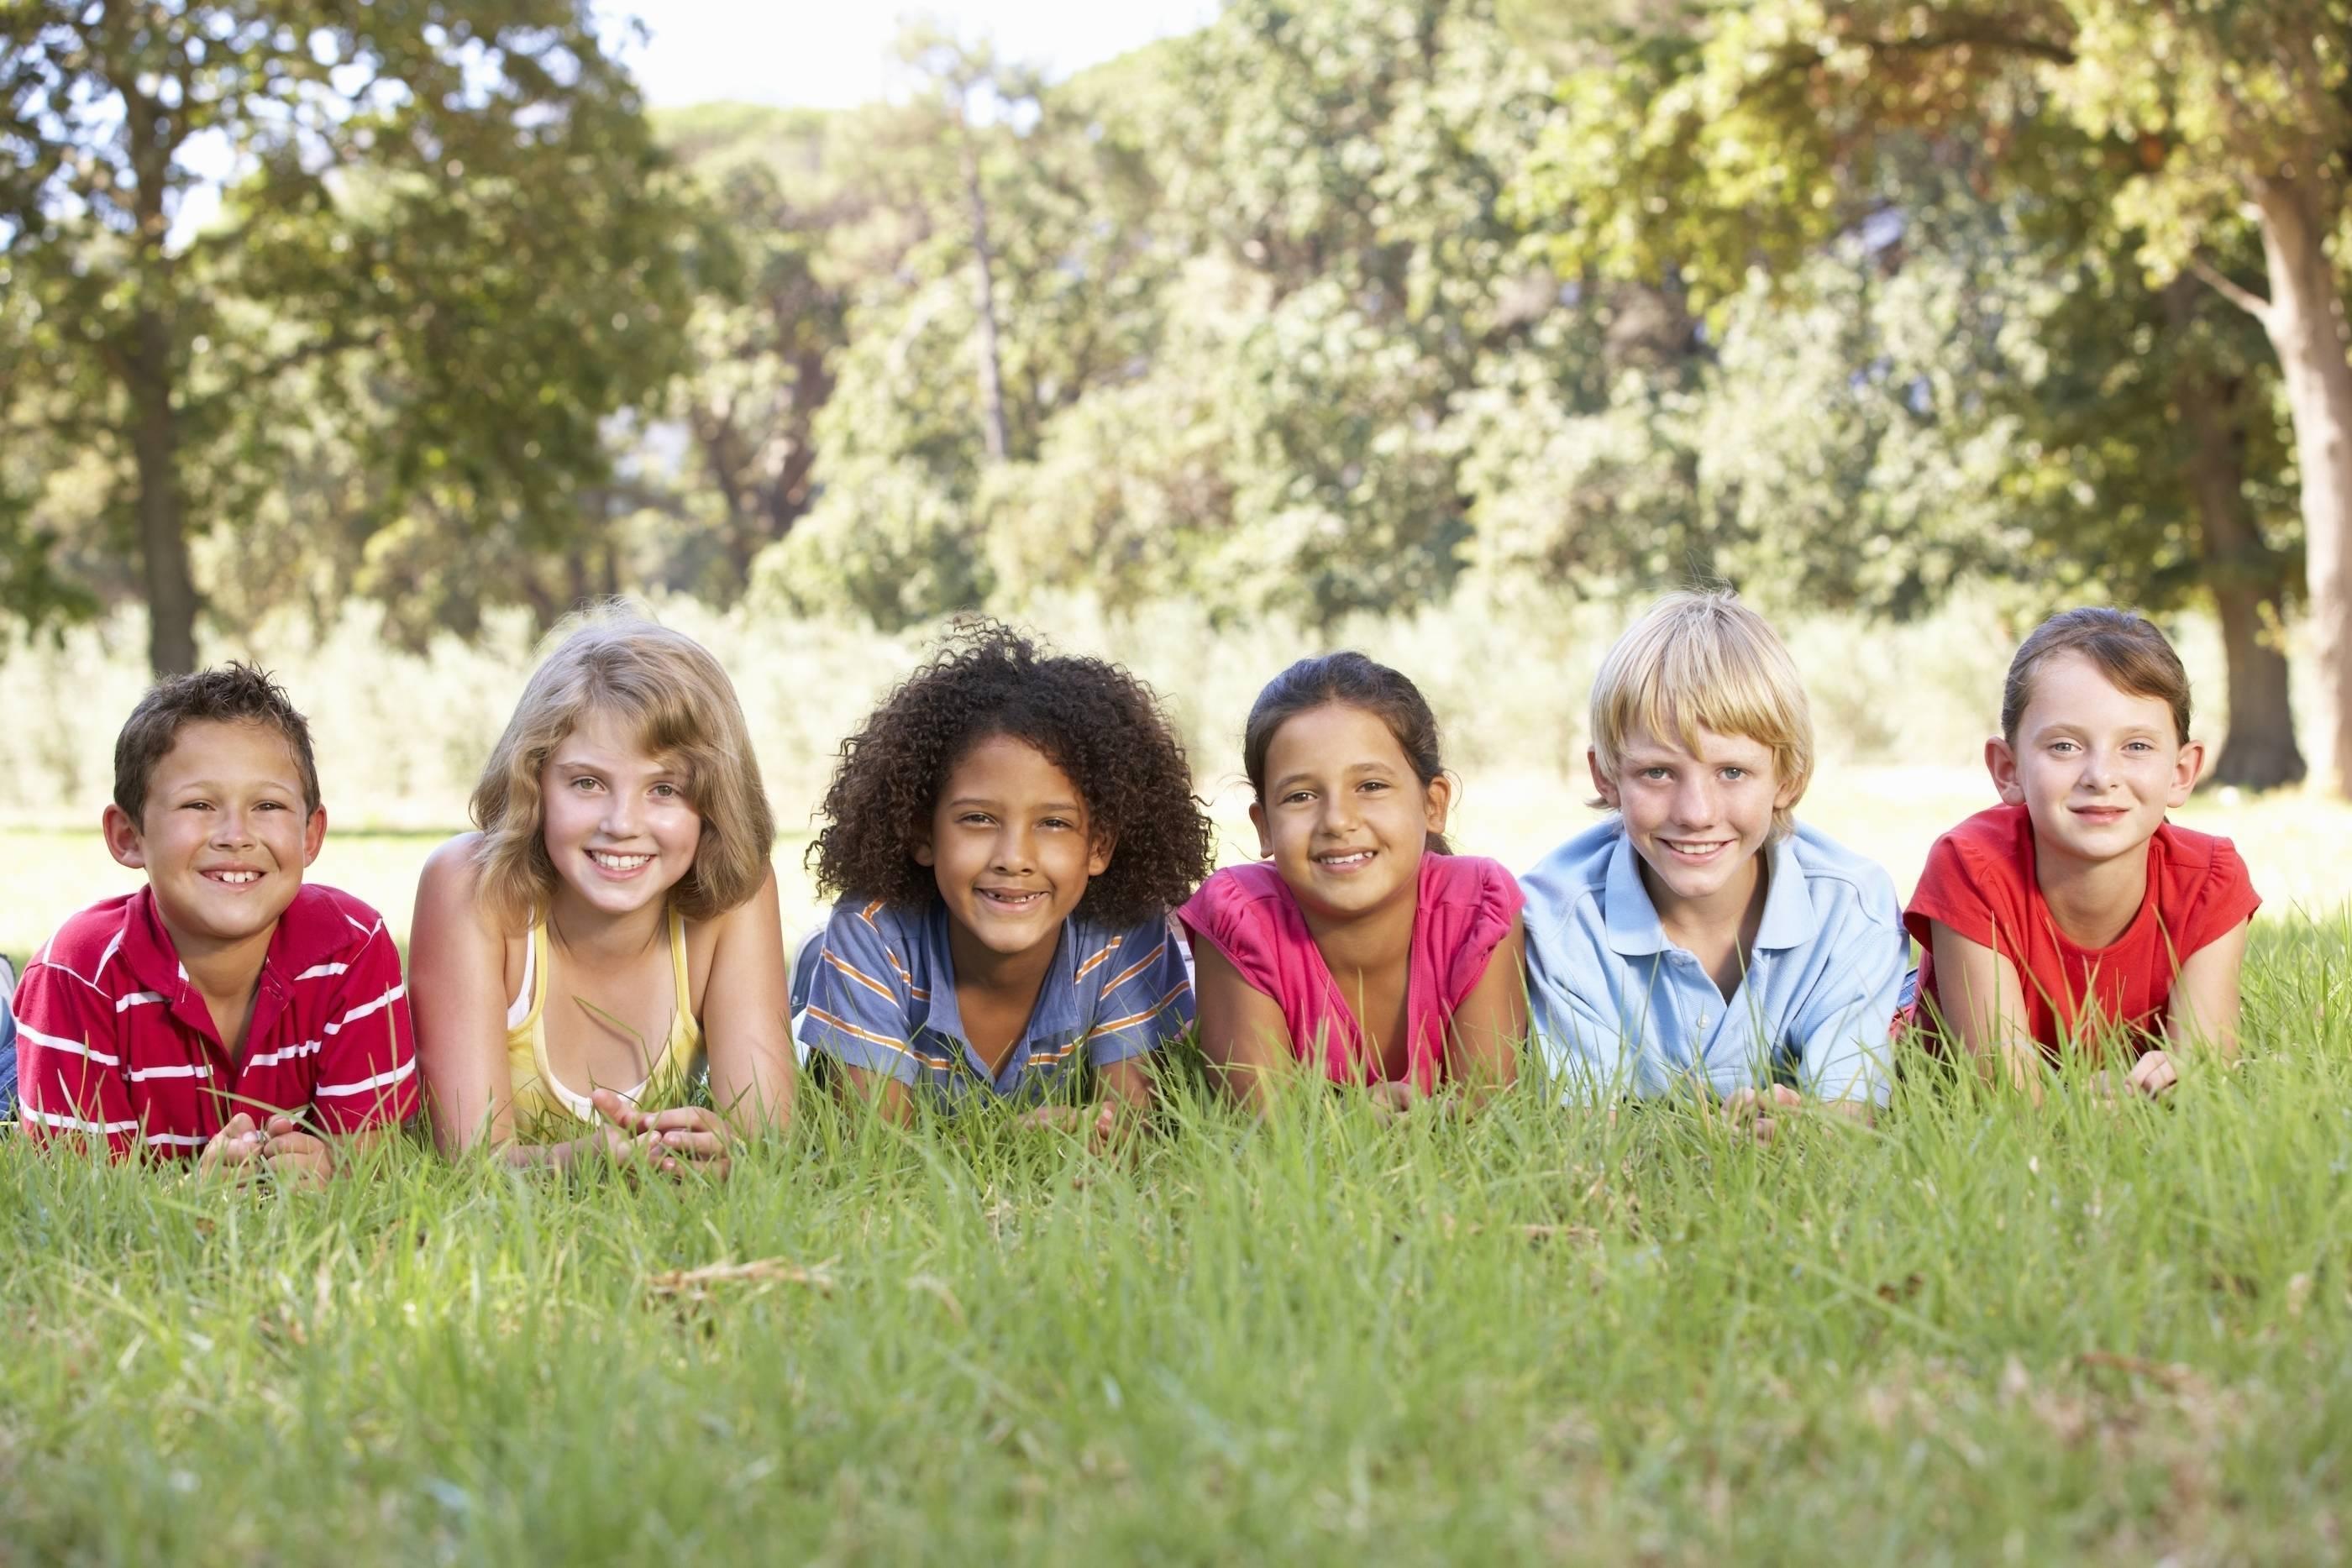 Registration for South Orange's Summer Playground Program Begins March 16